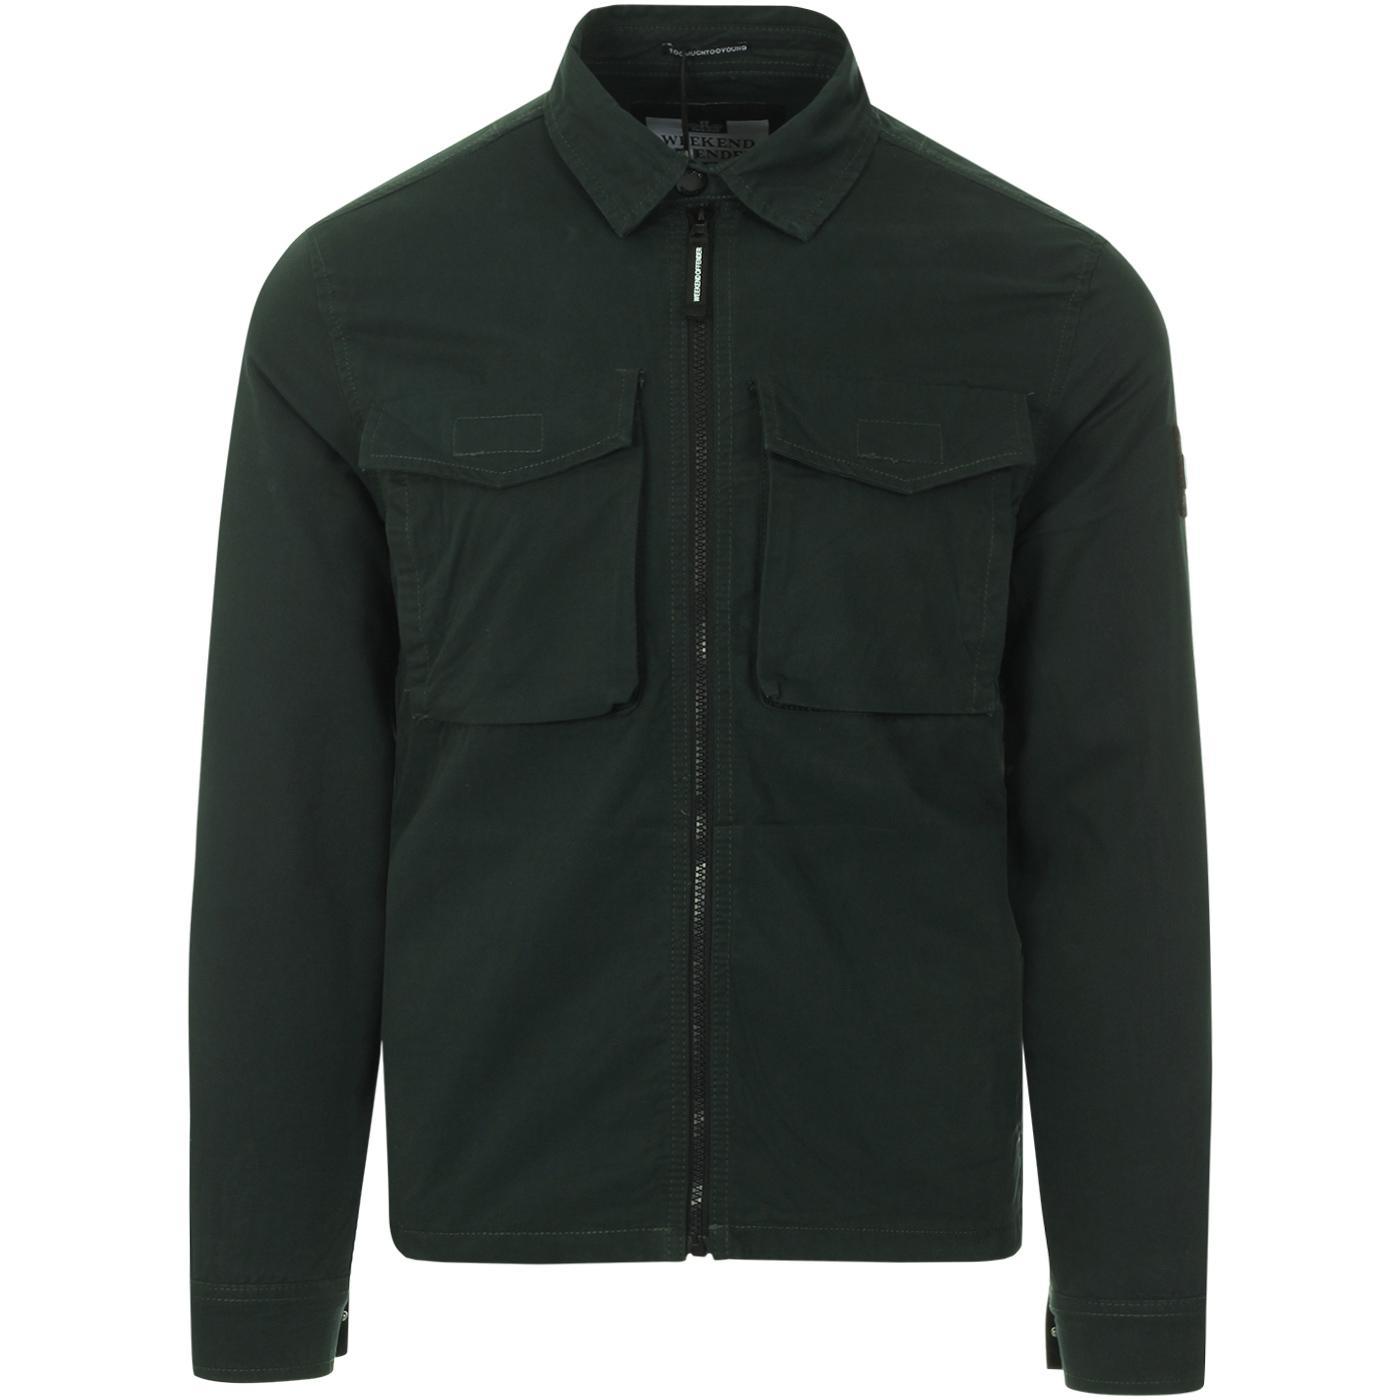 Pileggi WEEKEND OFFENDER Mod Military Shirt Jacket